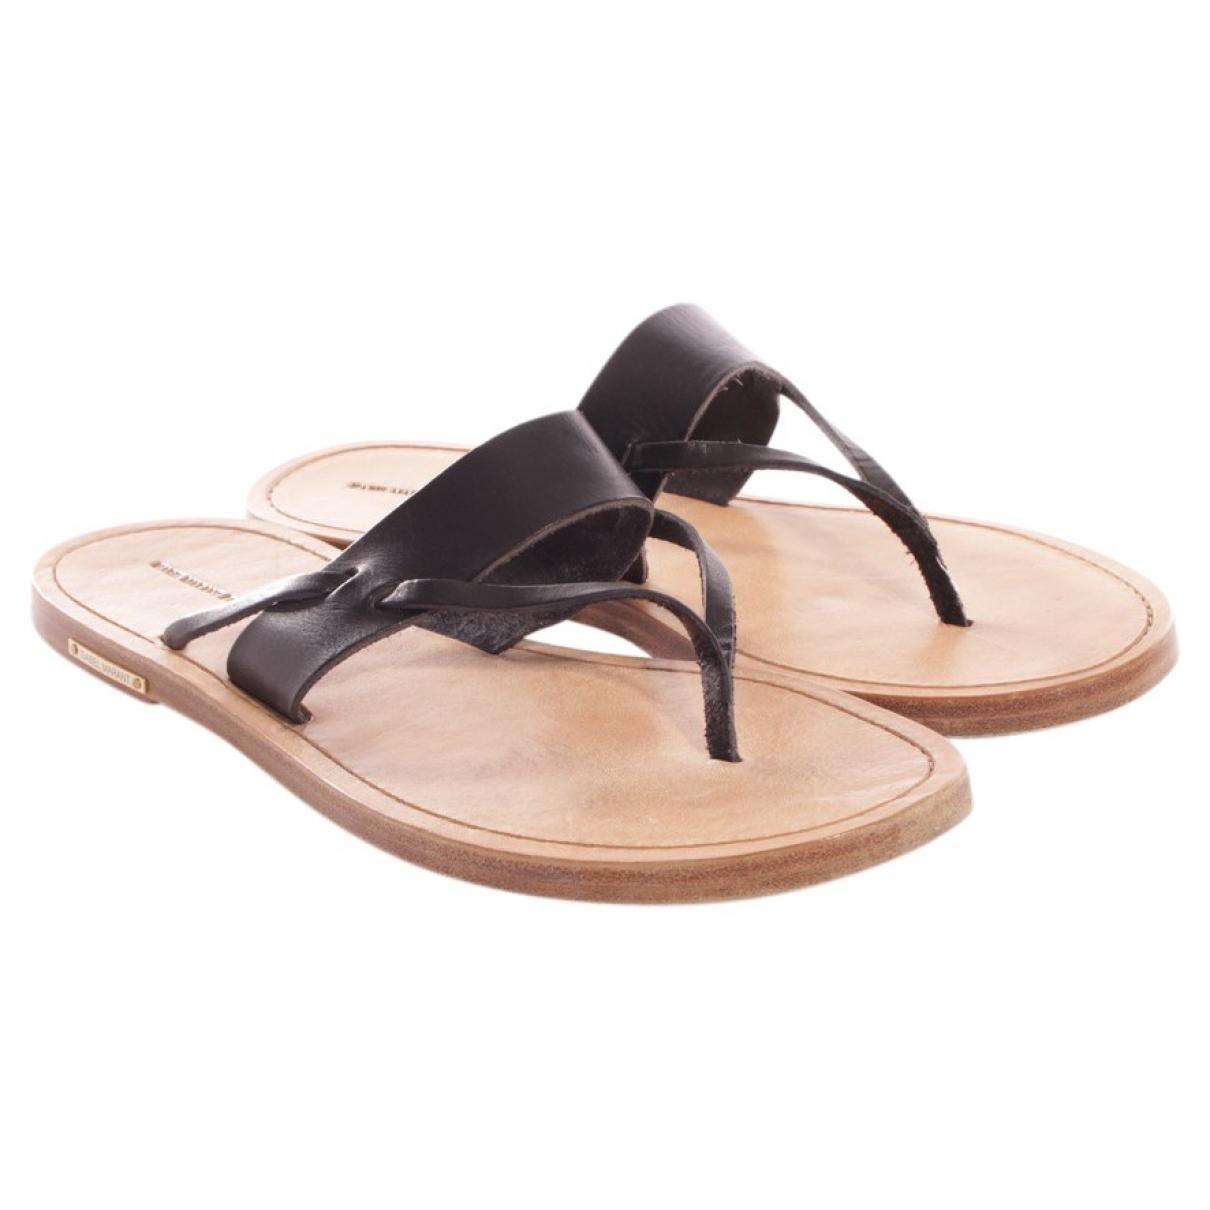 Isabel Marant \N Black Leather Sandals for Women 41.5 EU